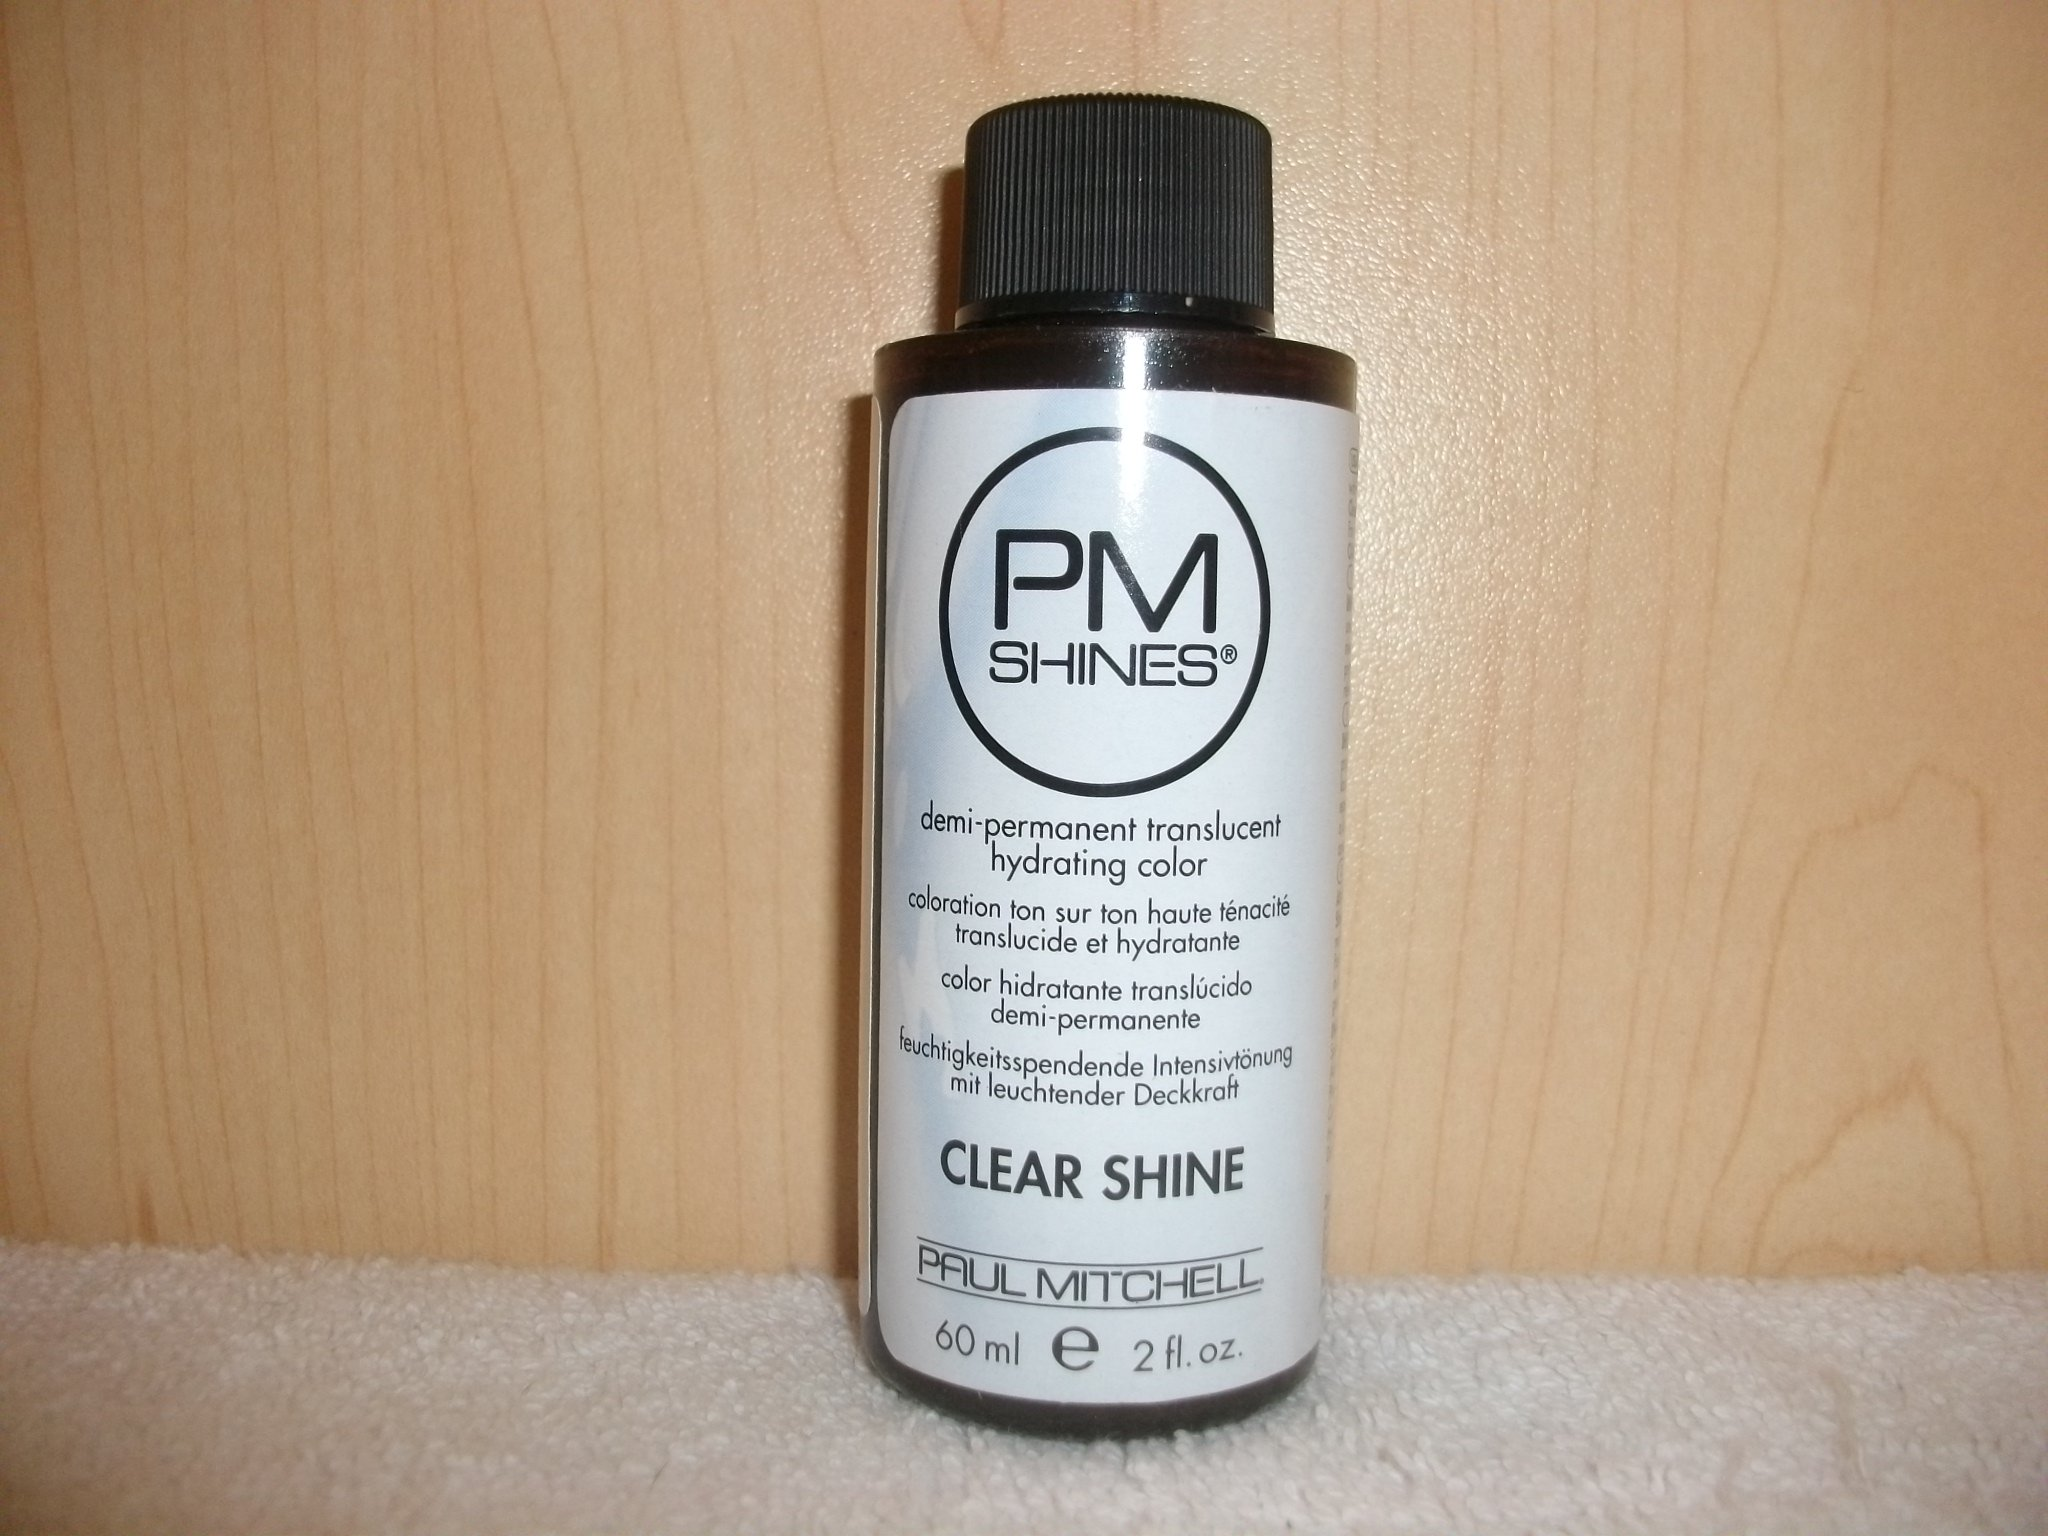 Paul Mitchell Pm Shines Clear Shine 2 Oz.